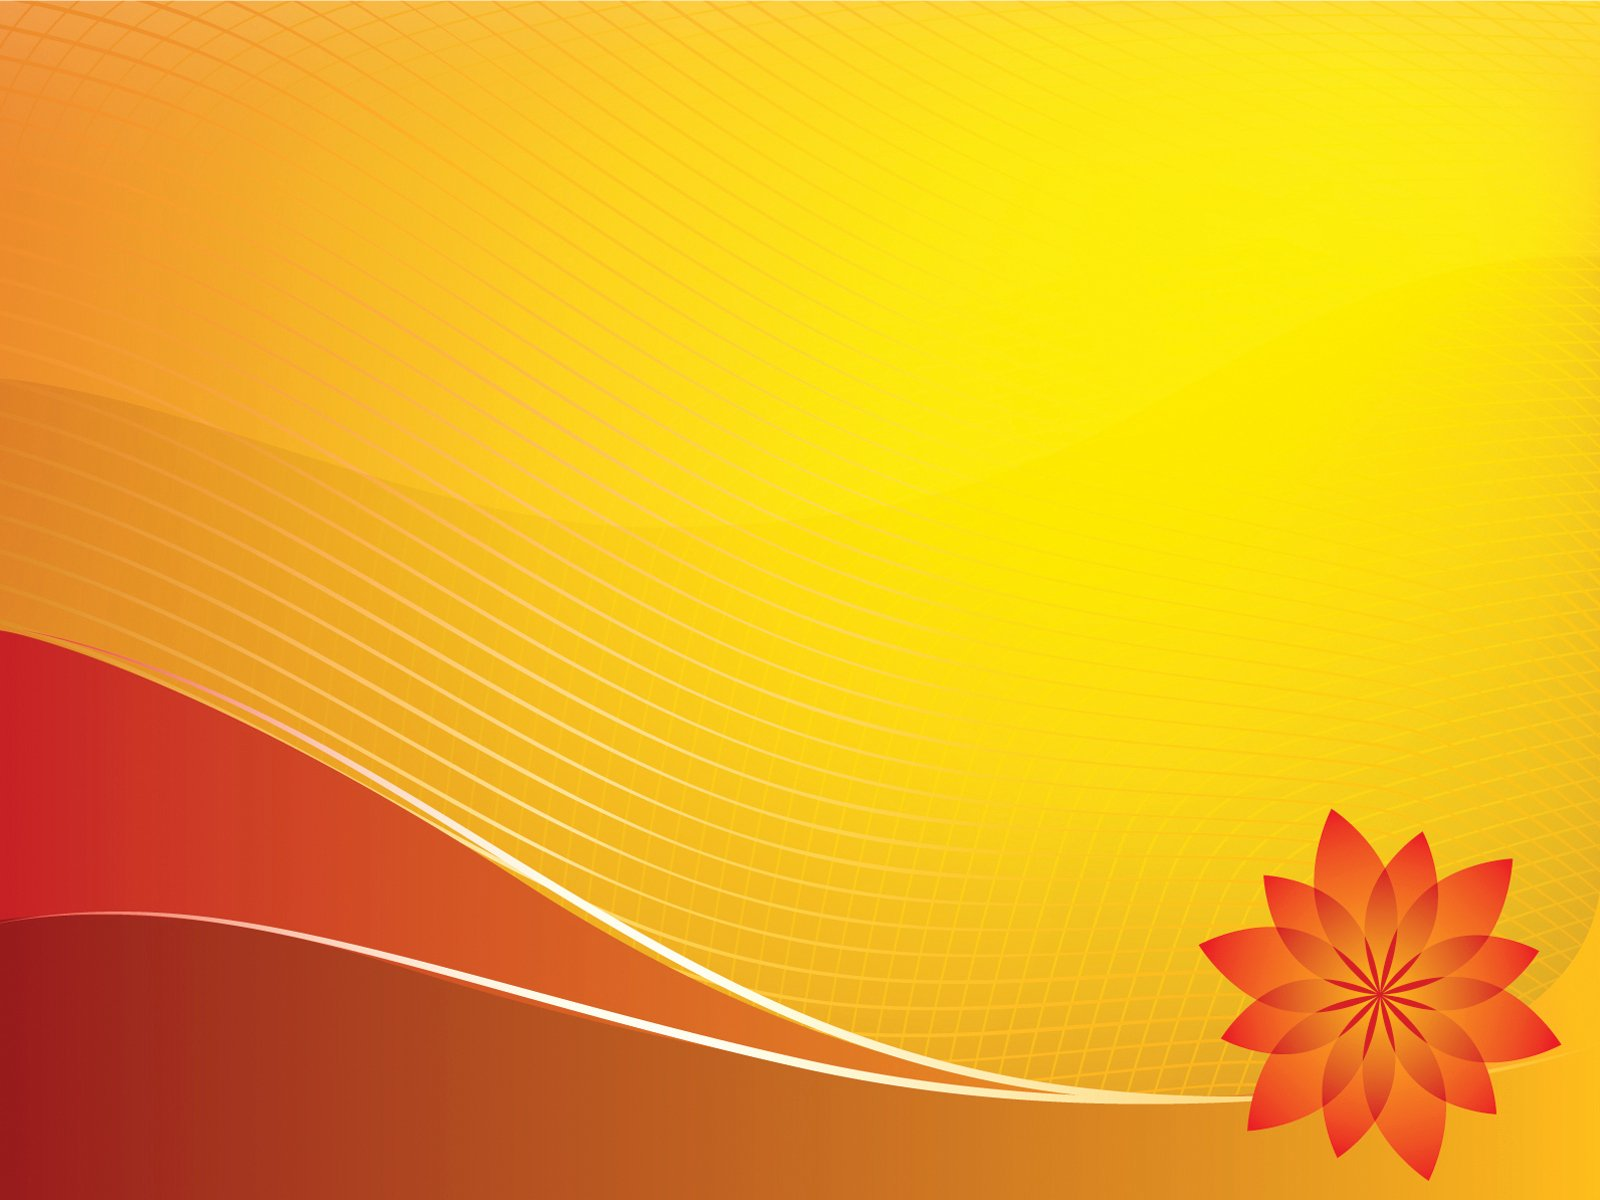 Orange Sun Design Powerpoint Templates Holidays orange